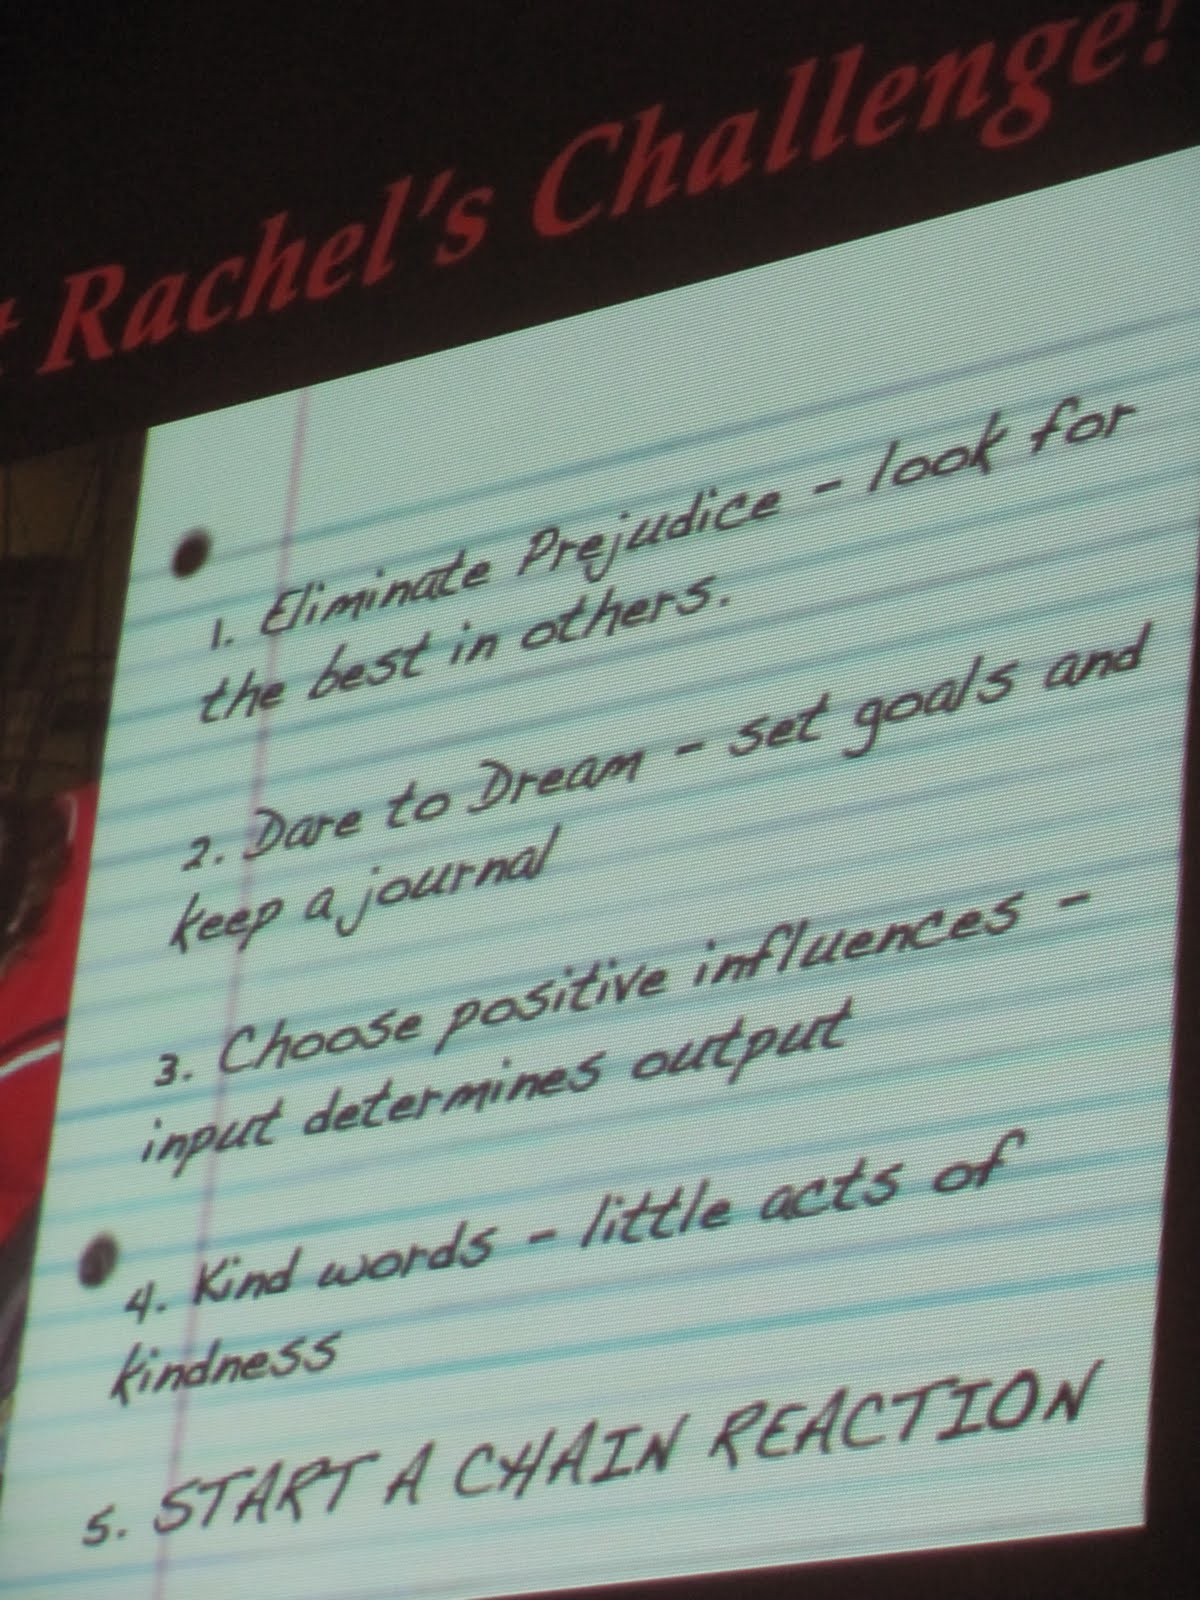 Rachels Challenge Quotes Quotesgram